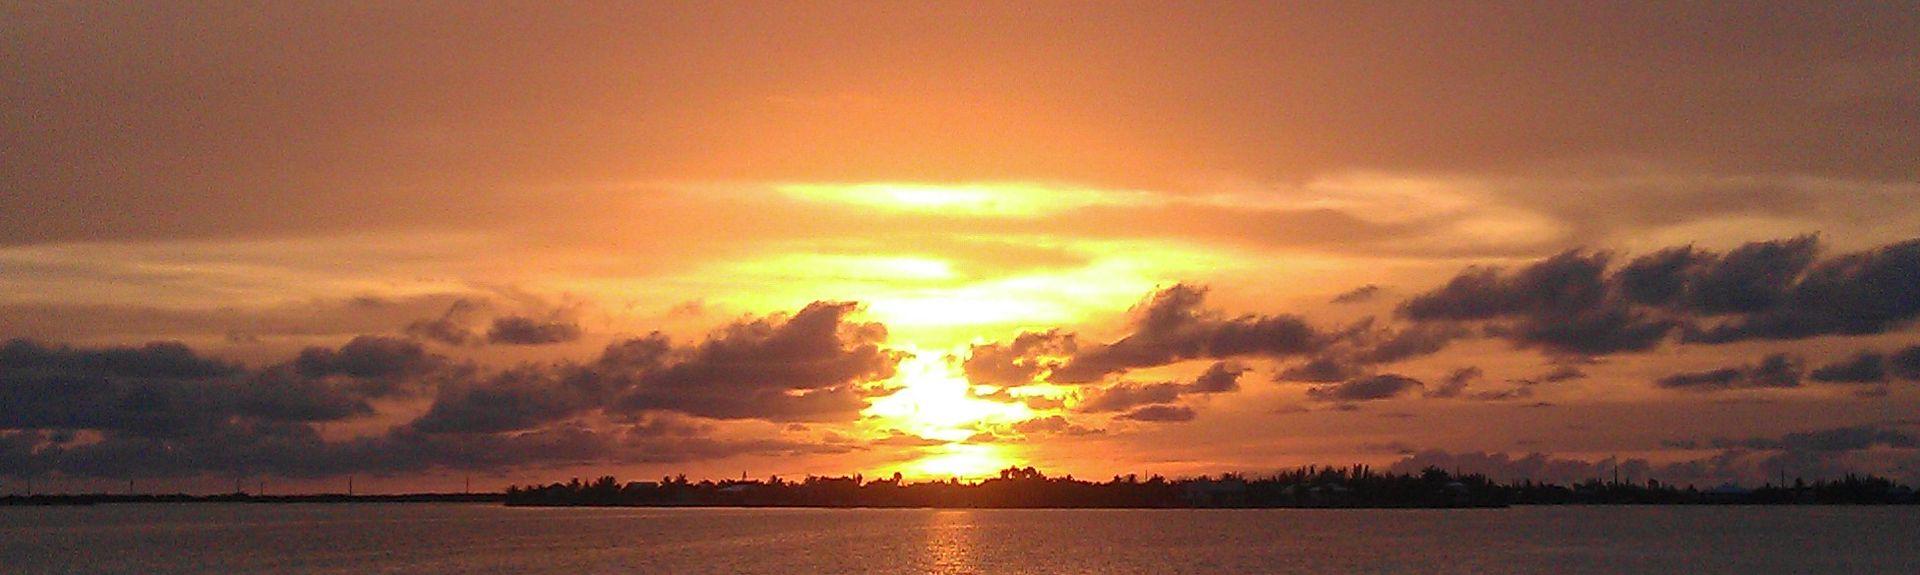 South Beach, Key West, FL, USA